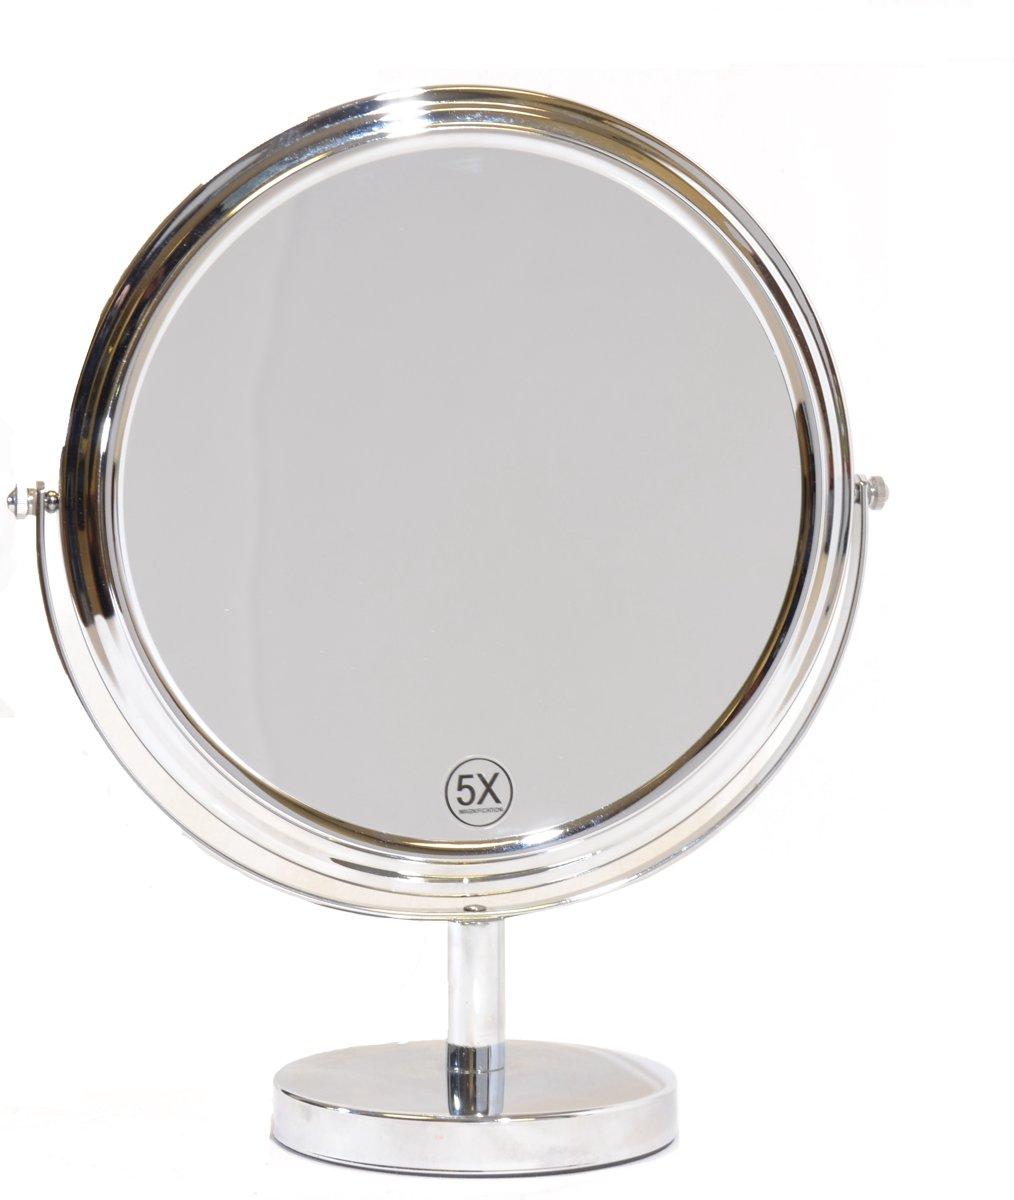 Grote make up spiegel 27cm 5x vergroting 8716181094777 for Grote lange spiegel